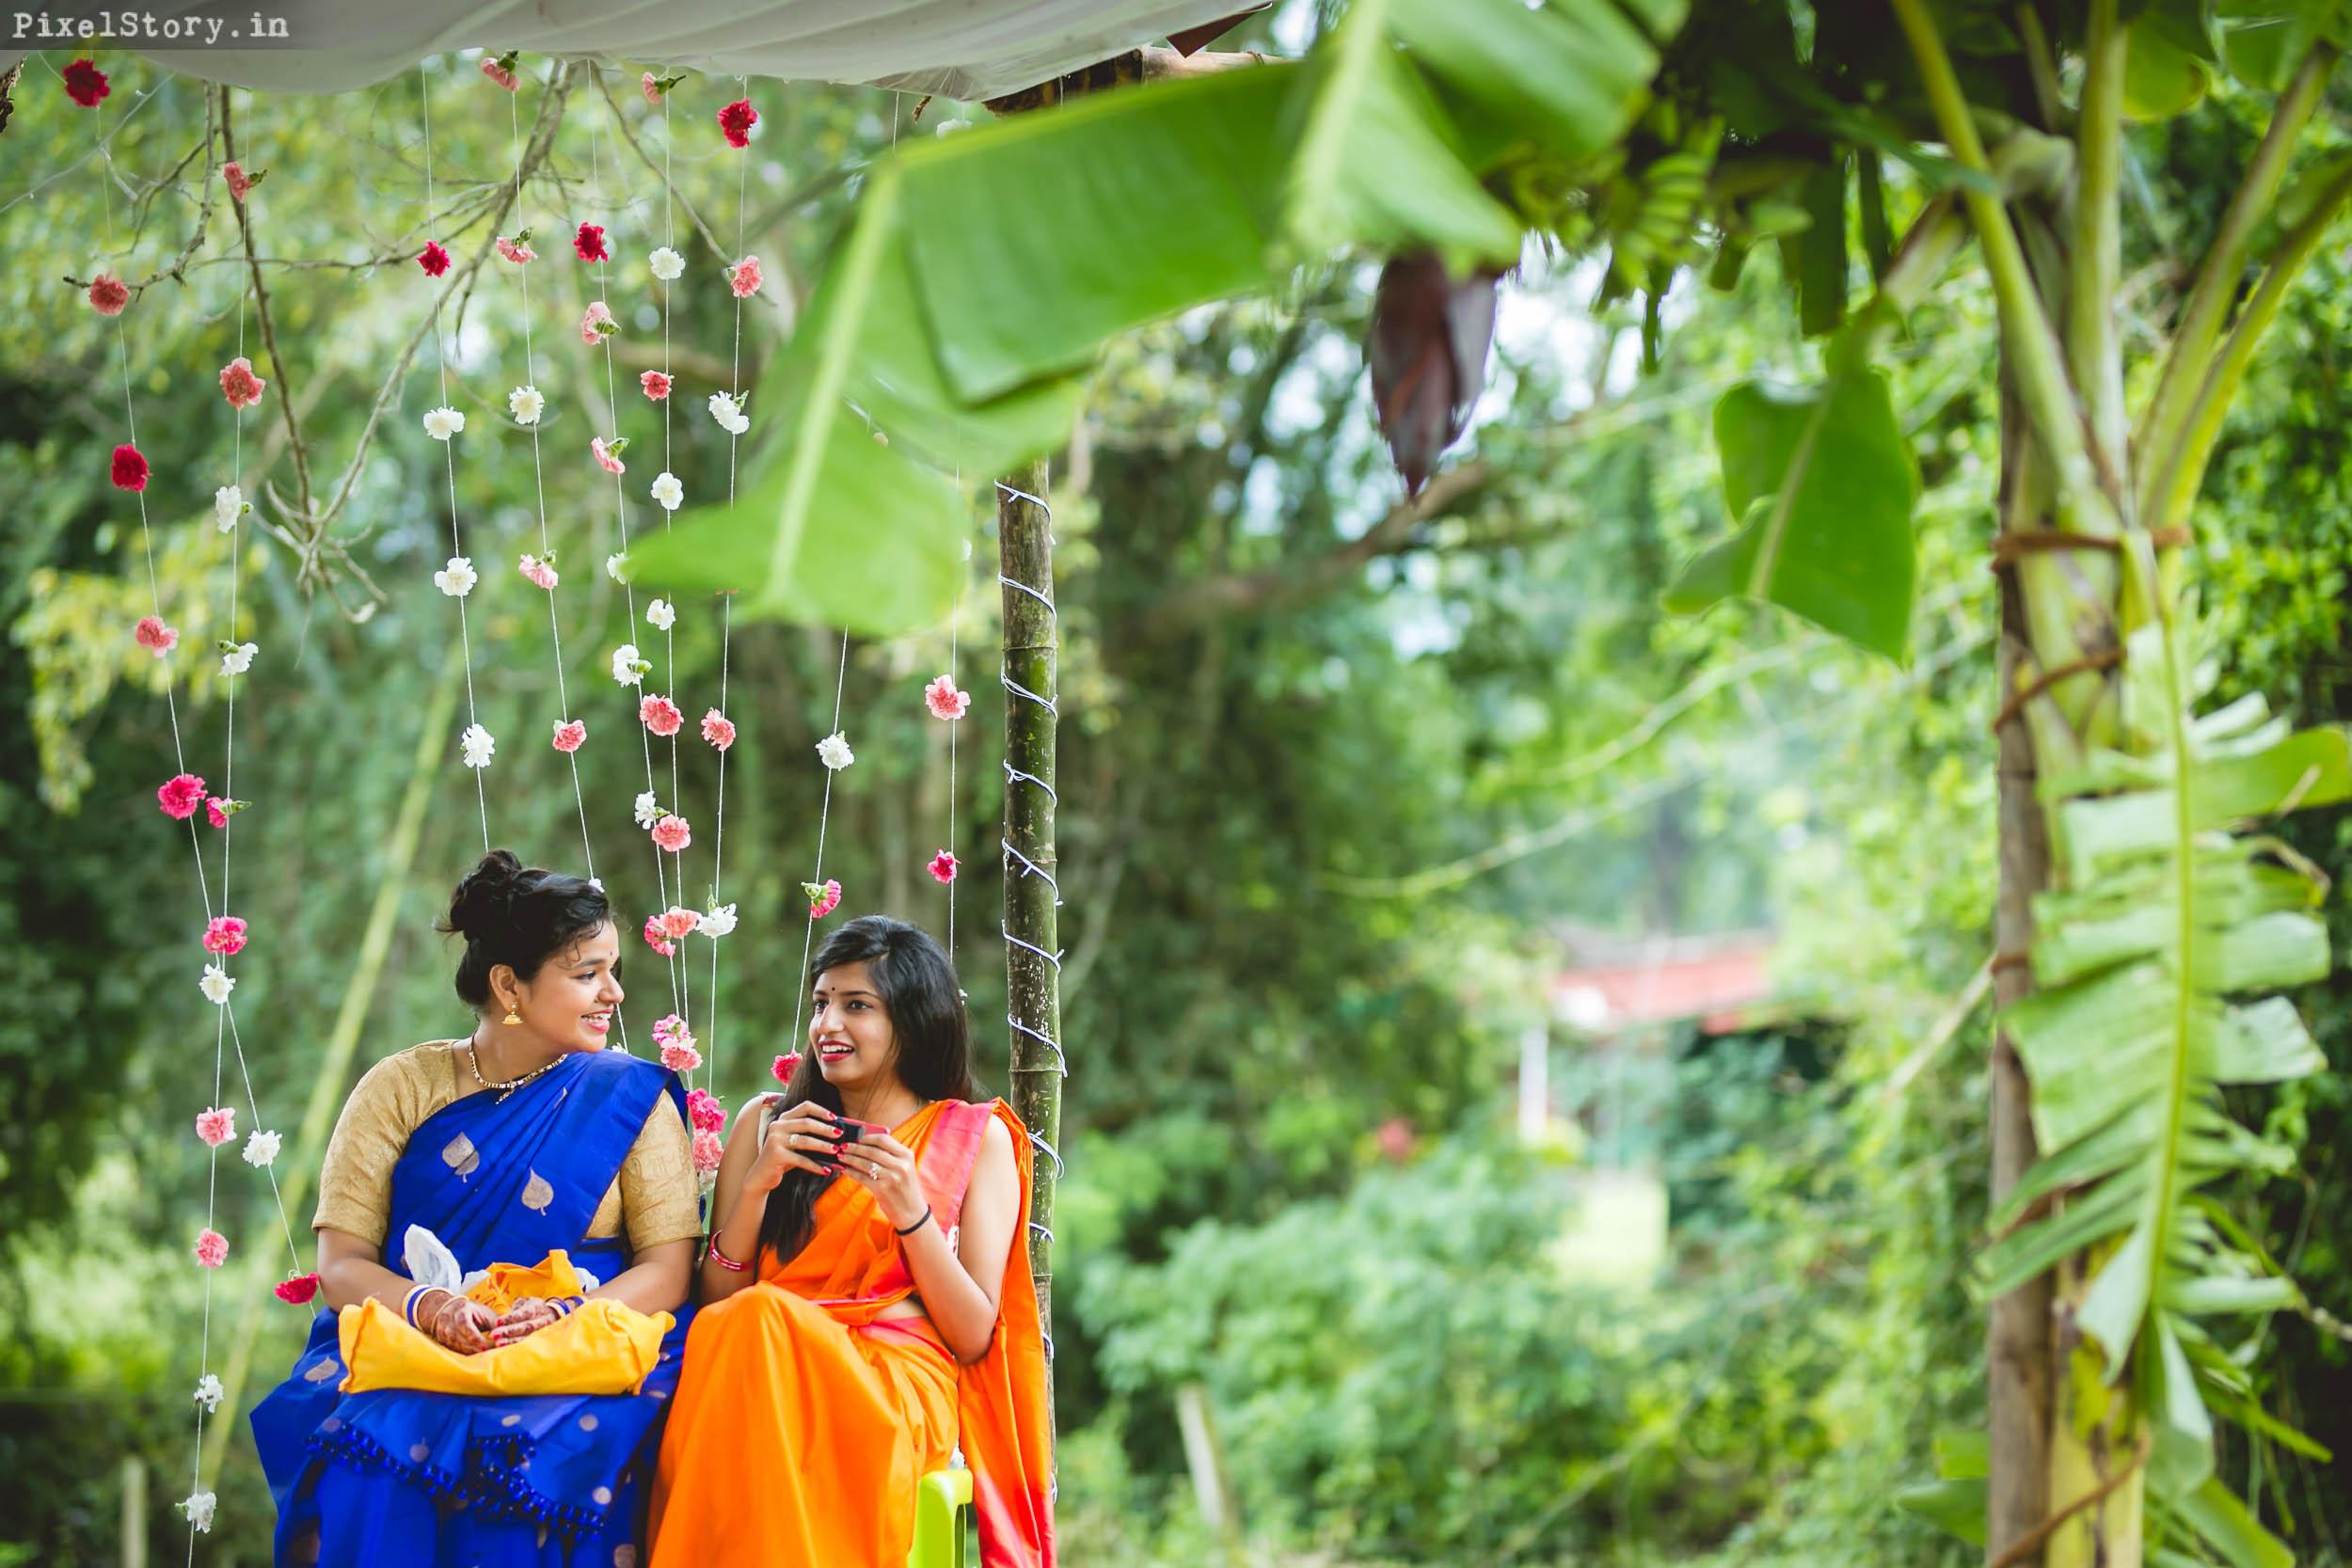 PixelStory-Jungle-Wedding-Photographer-Masinagudi-Indo-French082.jpg